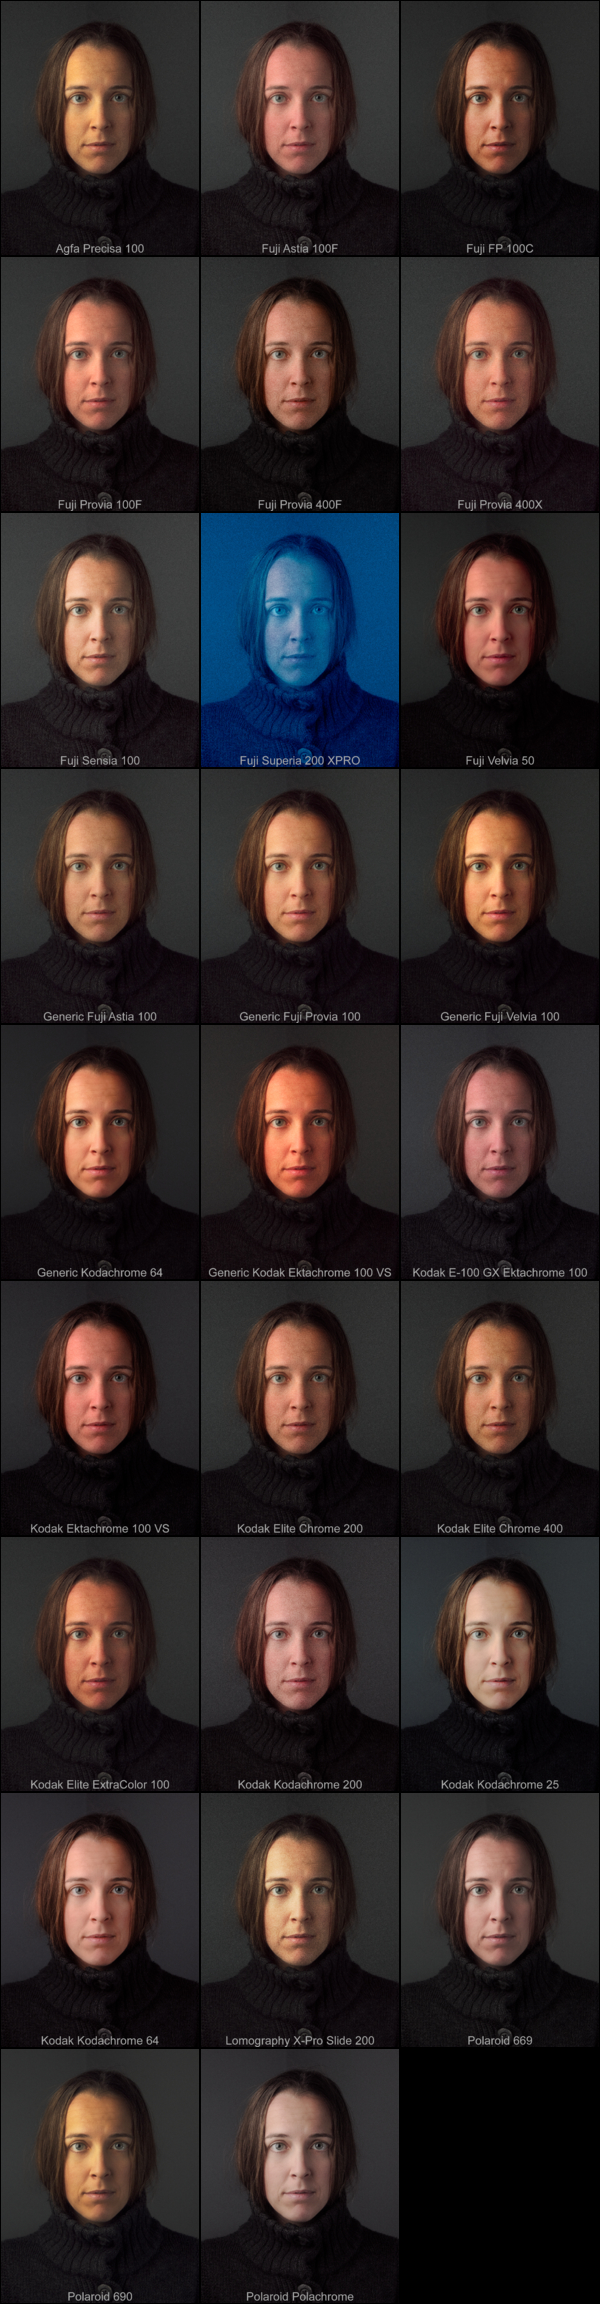 Pat David: Film Emulation Presets in G'MIC (GIMP) [Addendum]